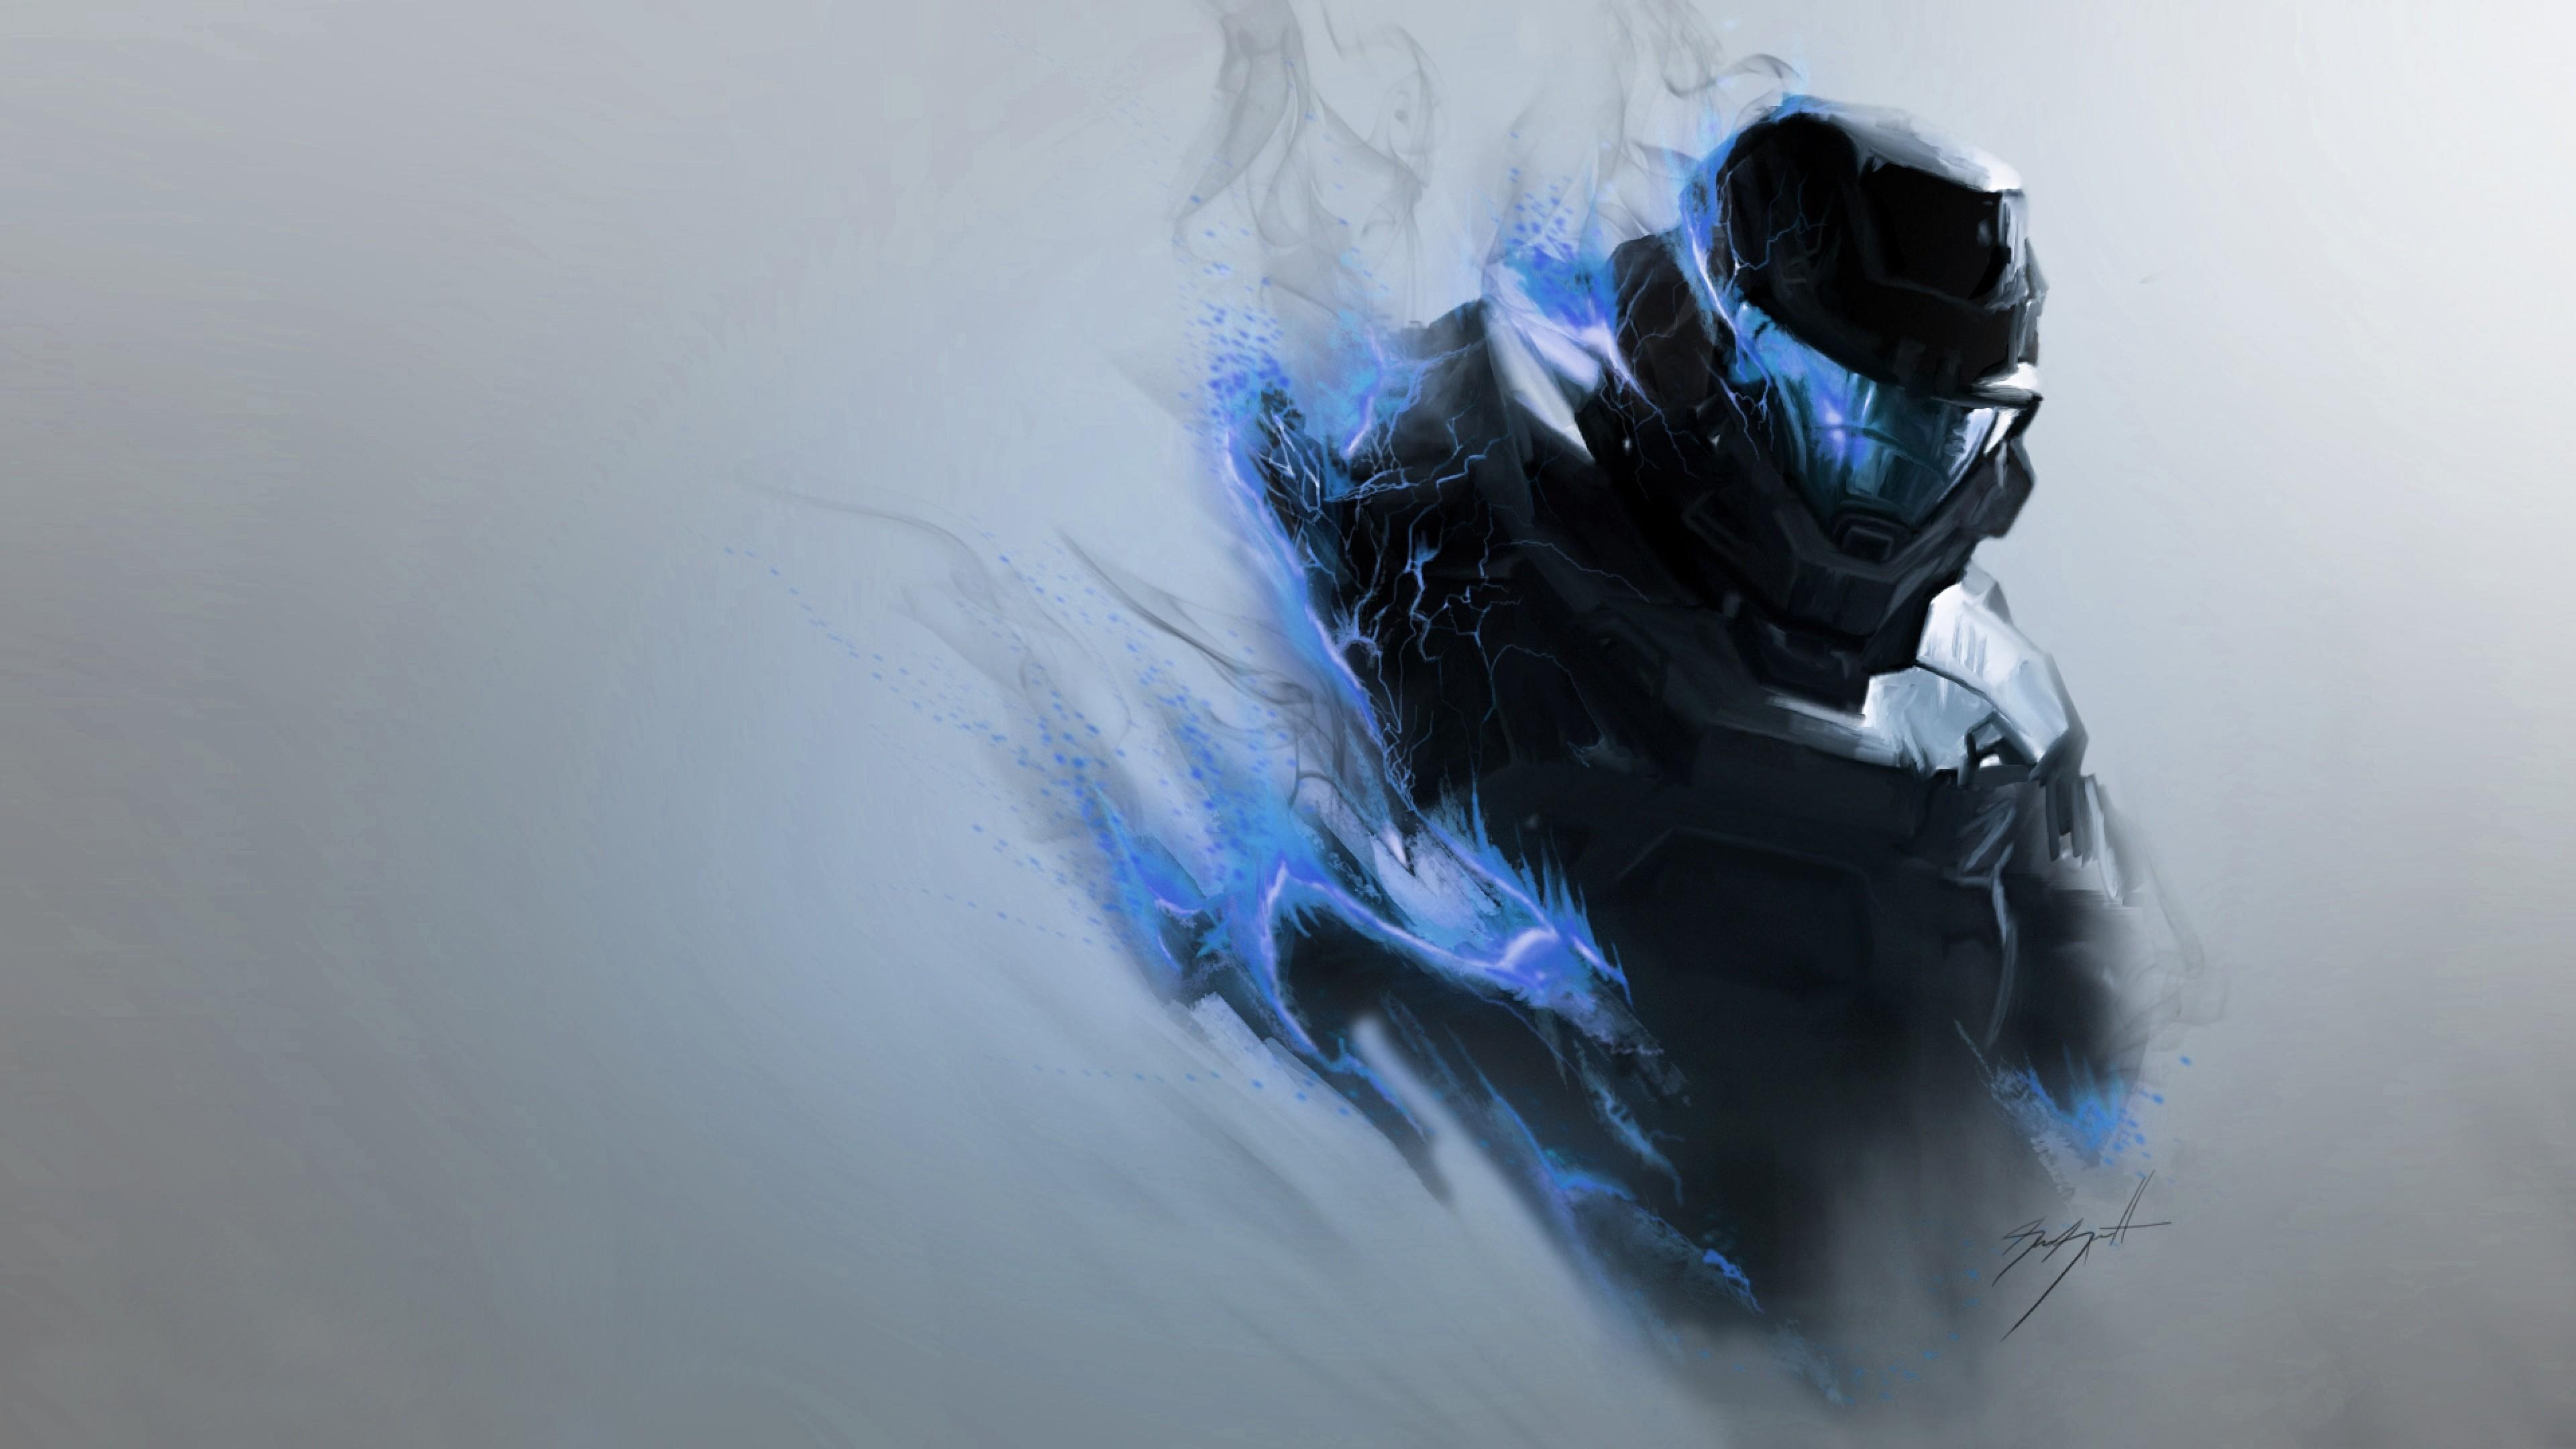 Halo, Smoke, Armor, Soldier, Helmet Wallpaper, Background 4K .